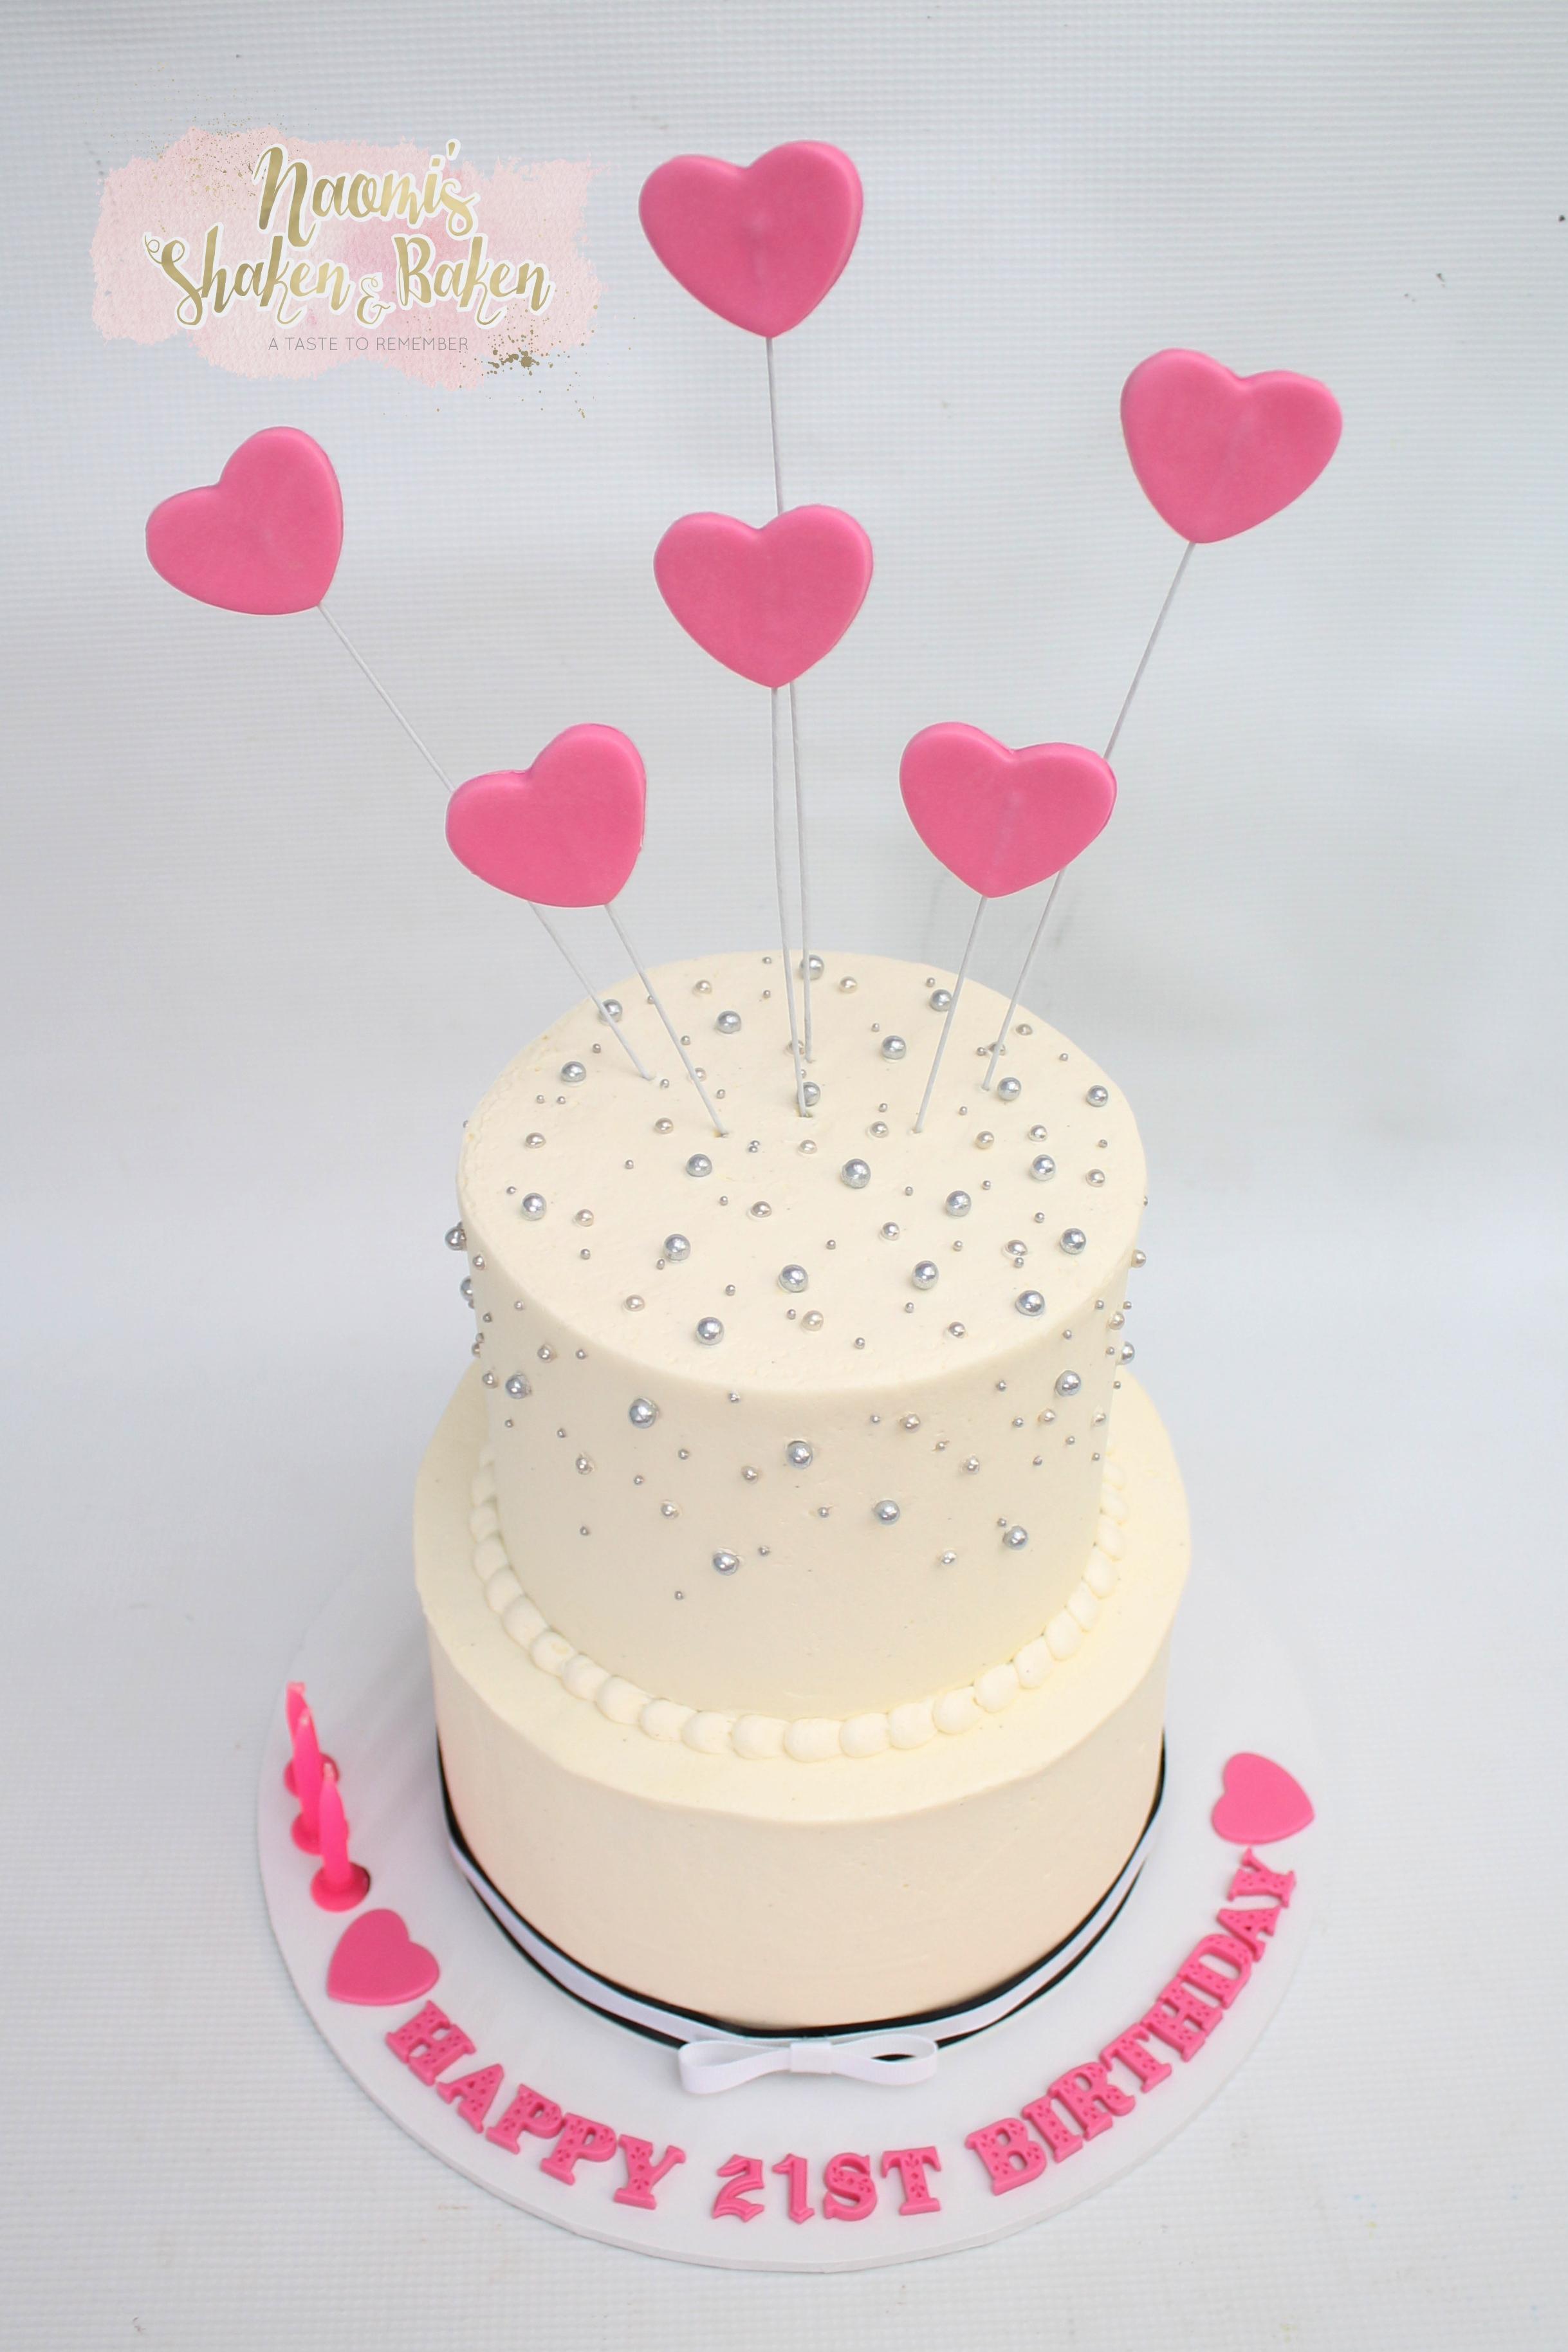 21st birthday cake caboolture